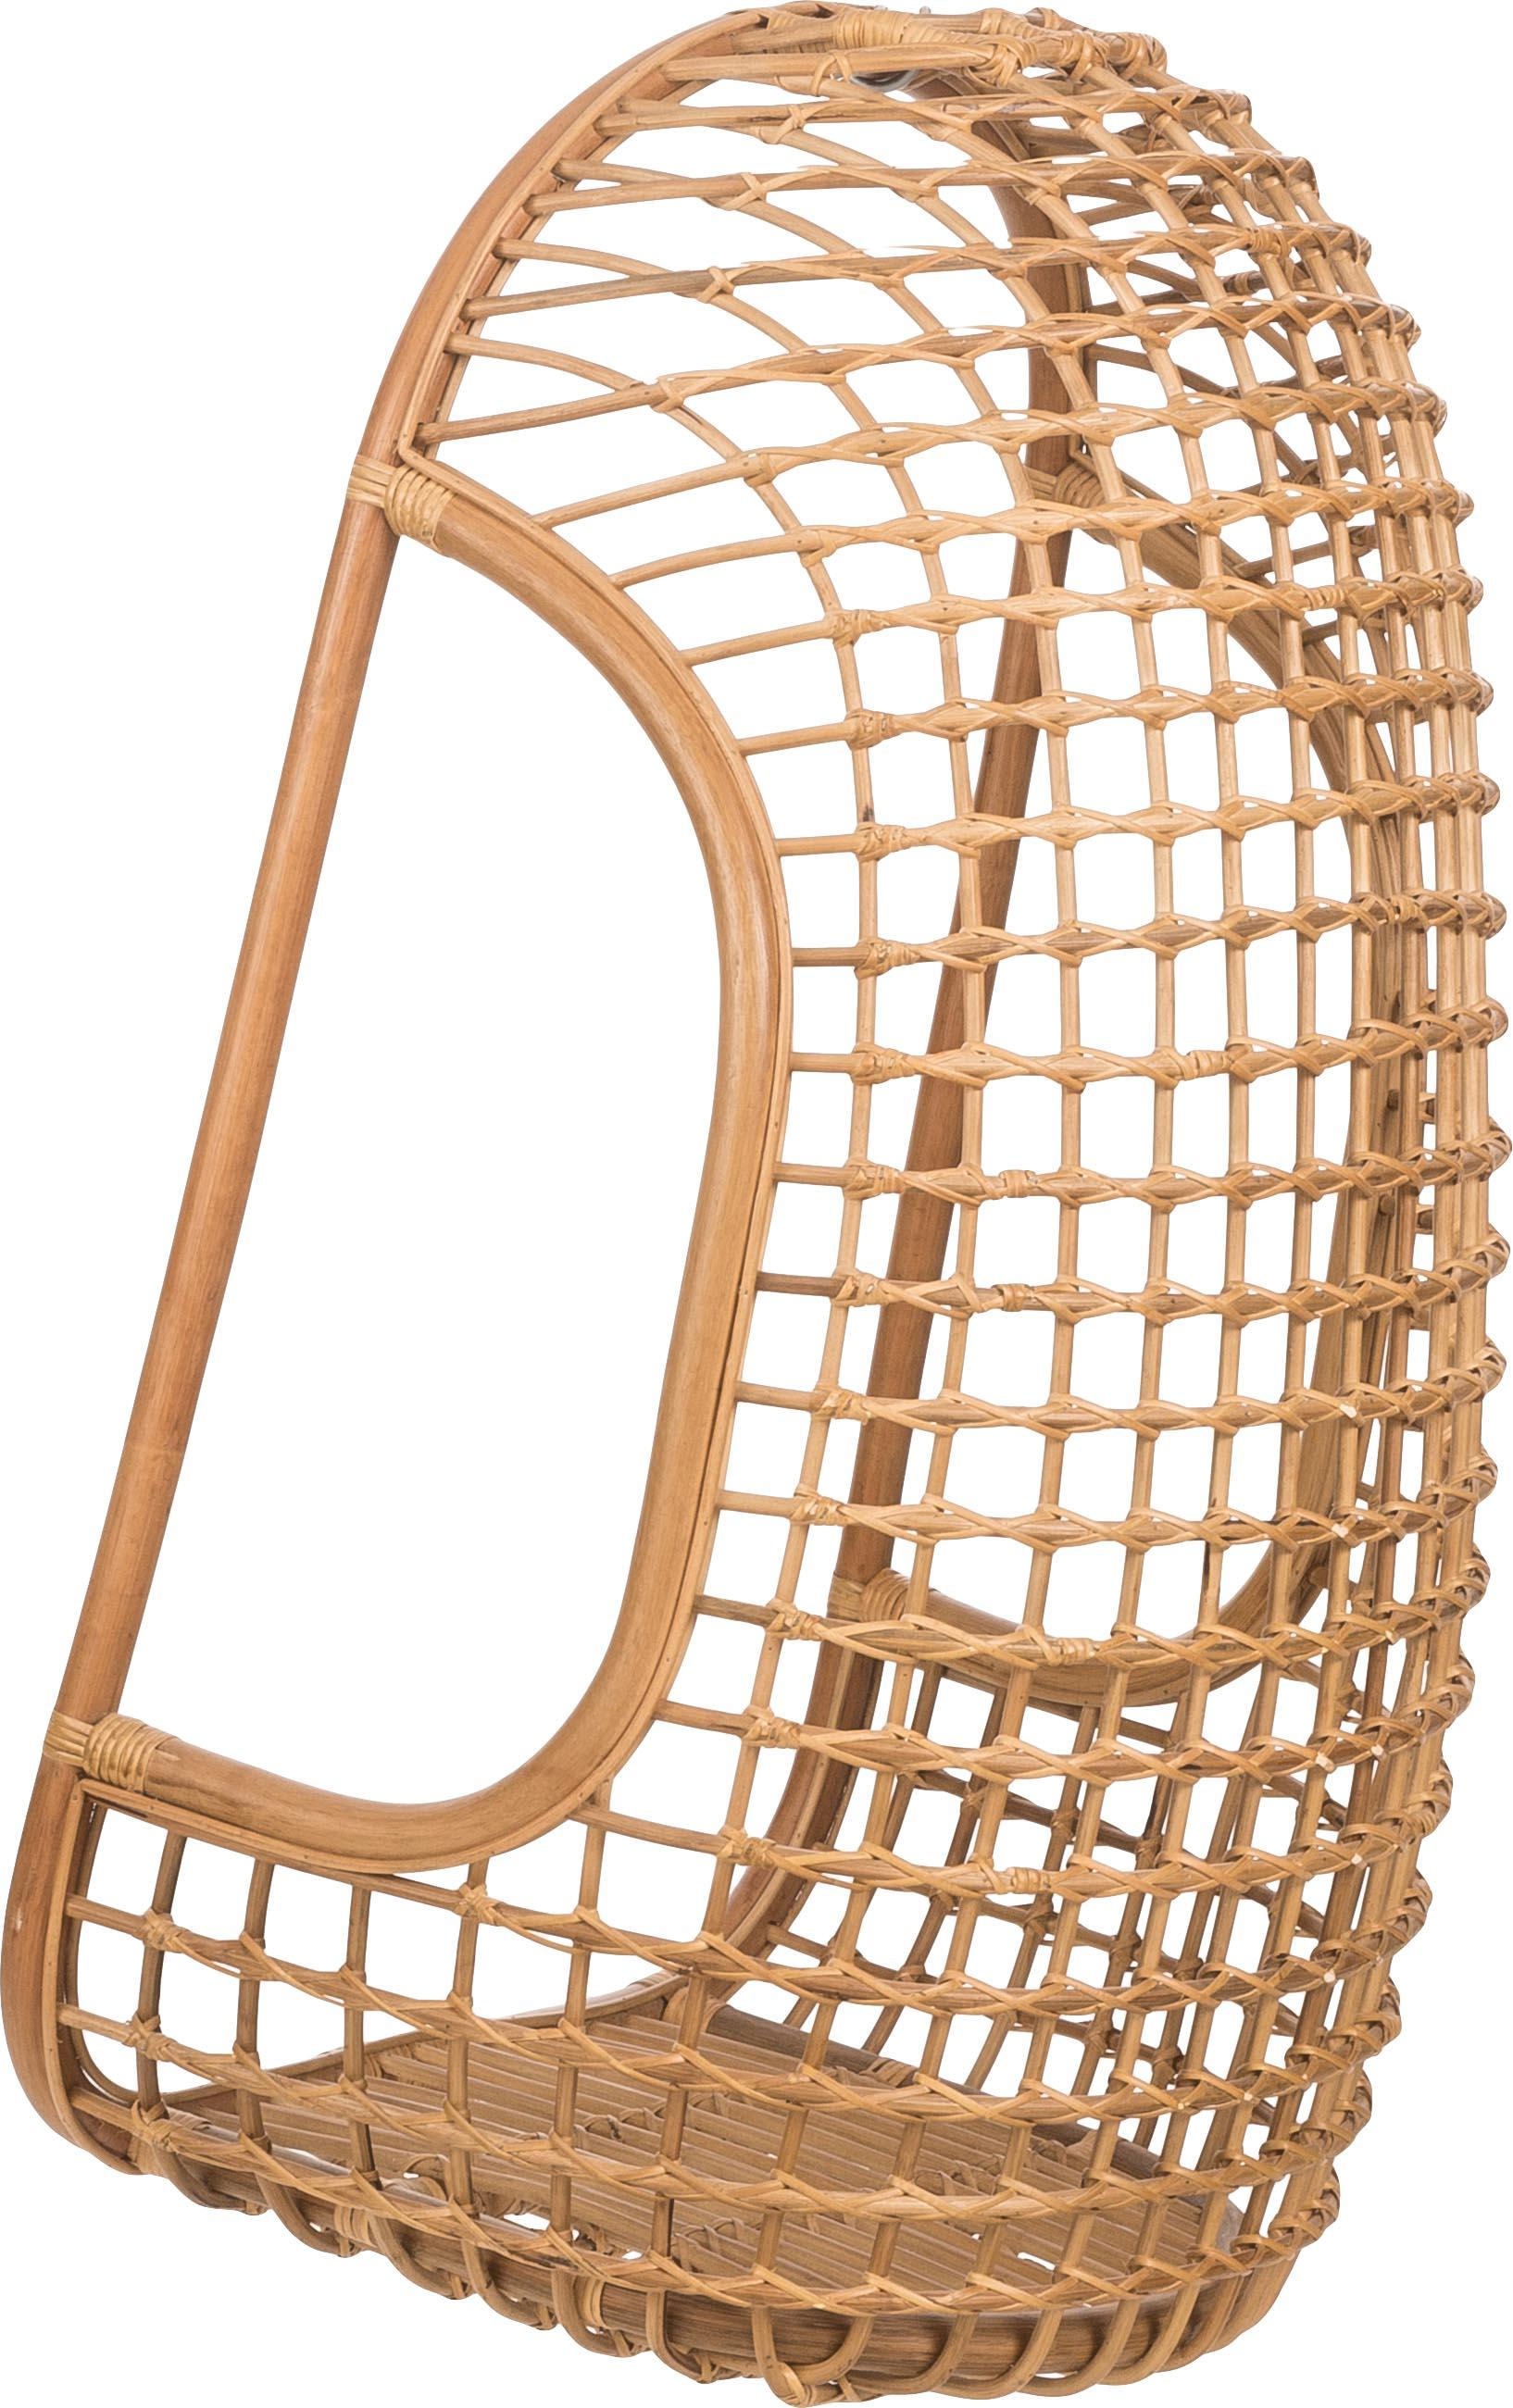 Rattan-Hängesessel Schwing, Rattan, 72 x 110 cm